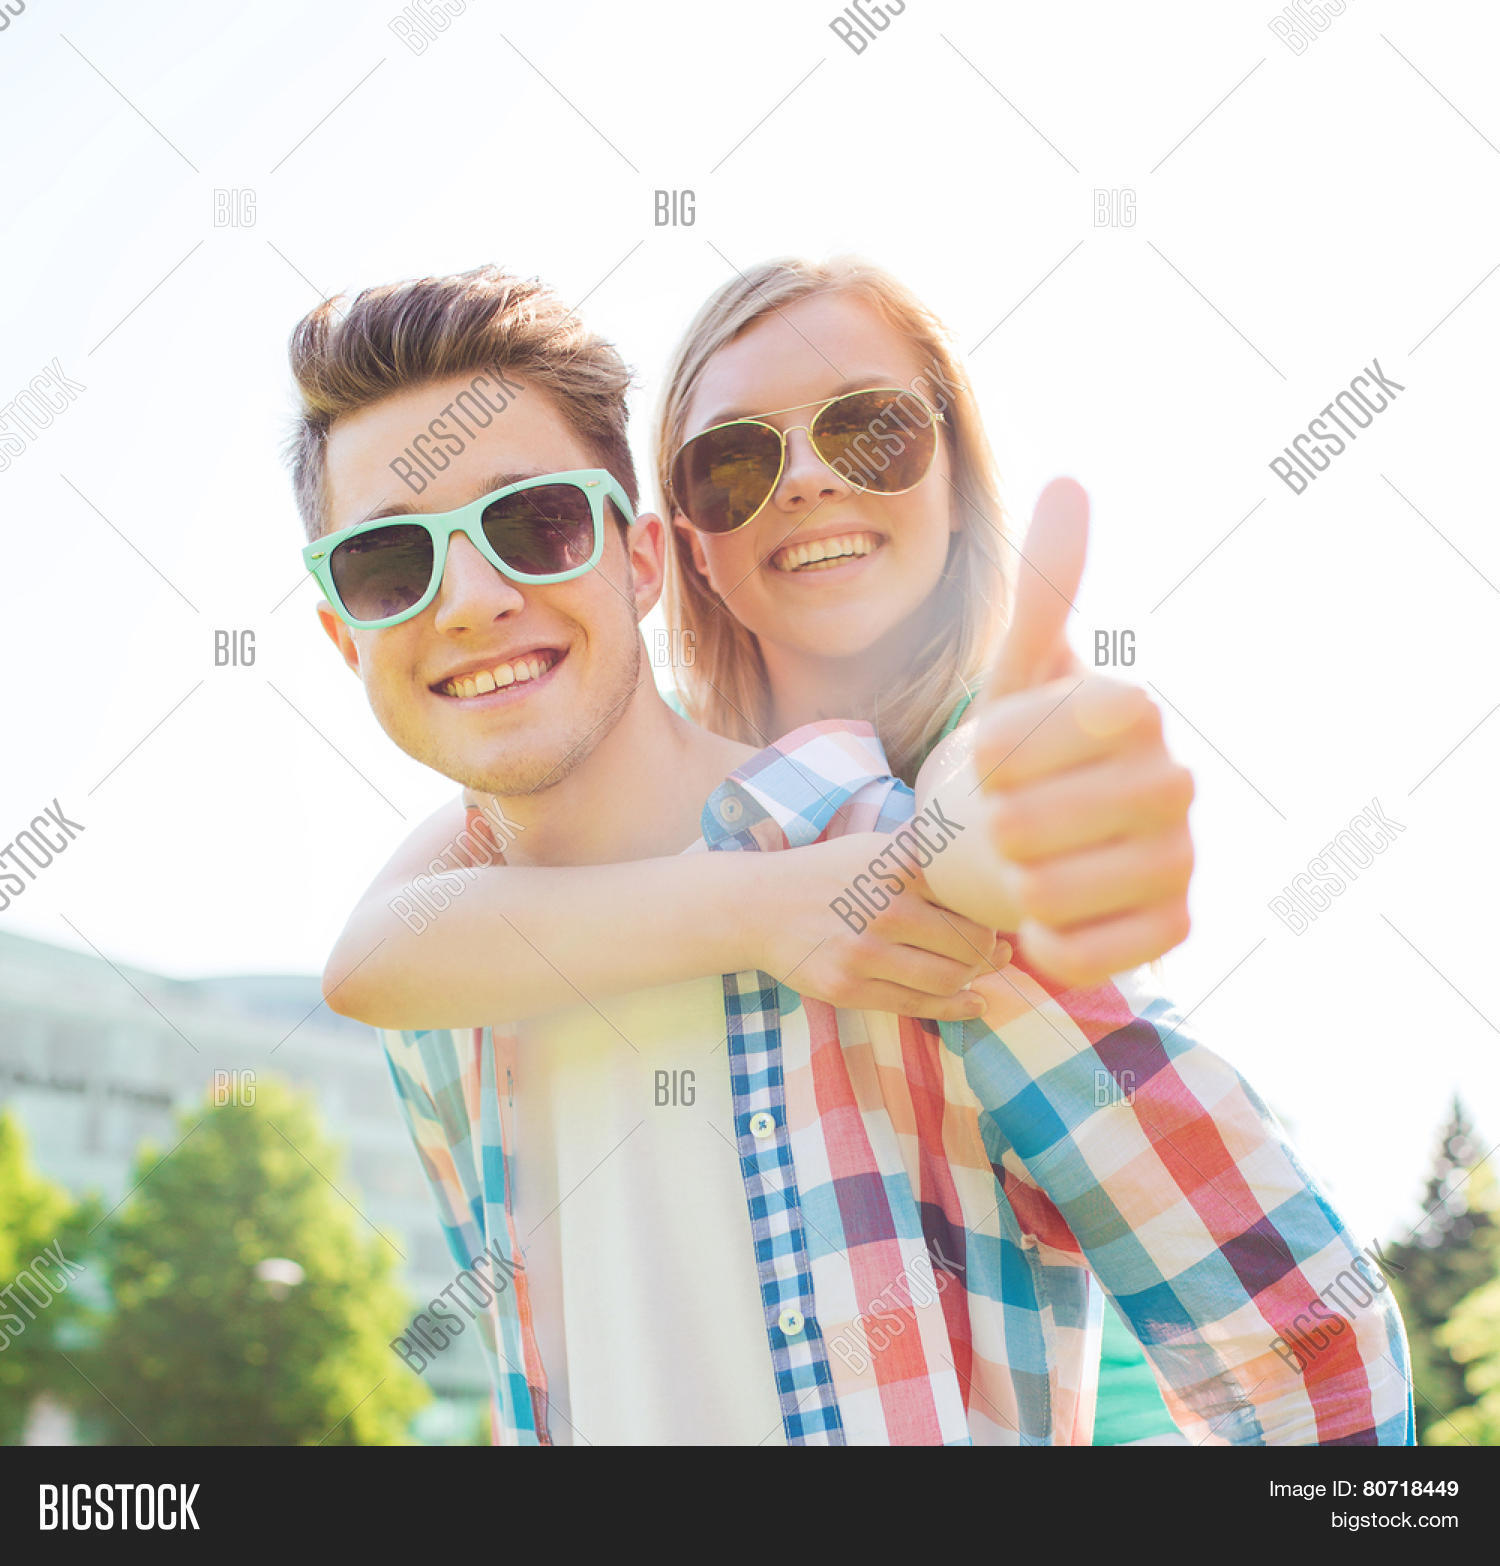 Couple Enjoying Their Summer Holidays Stock Photo: Summer Holidays, Vacation, Love, Image & Photo